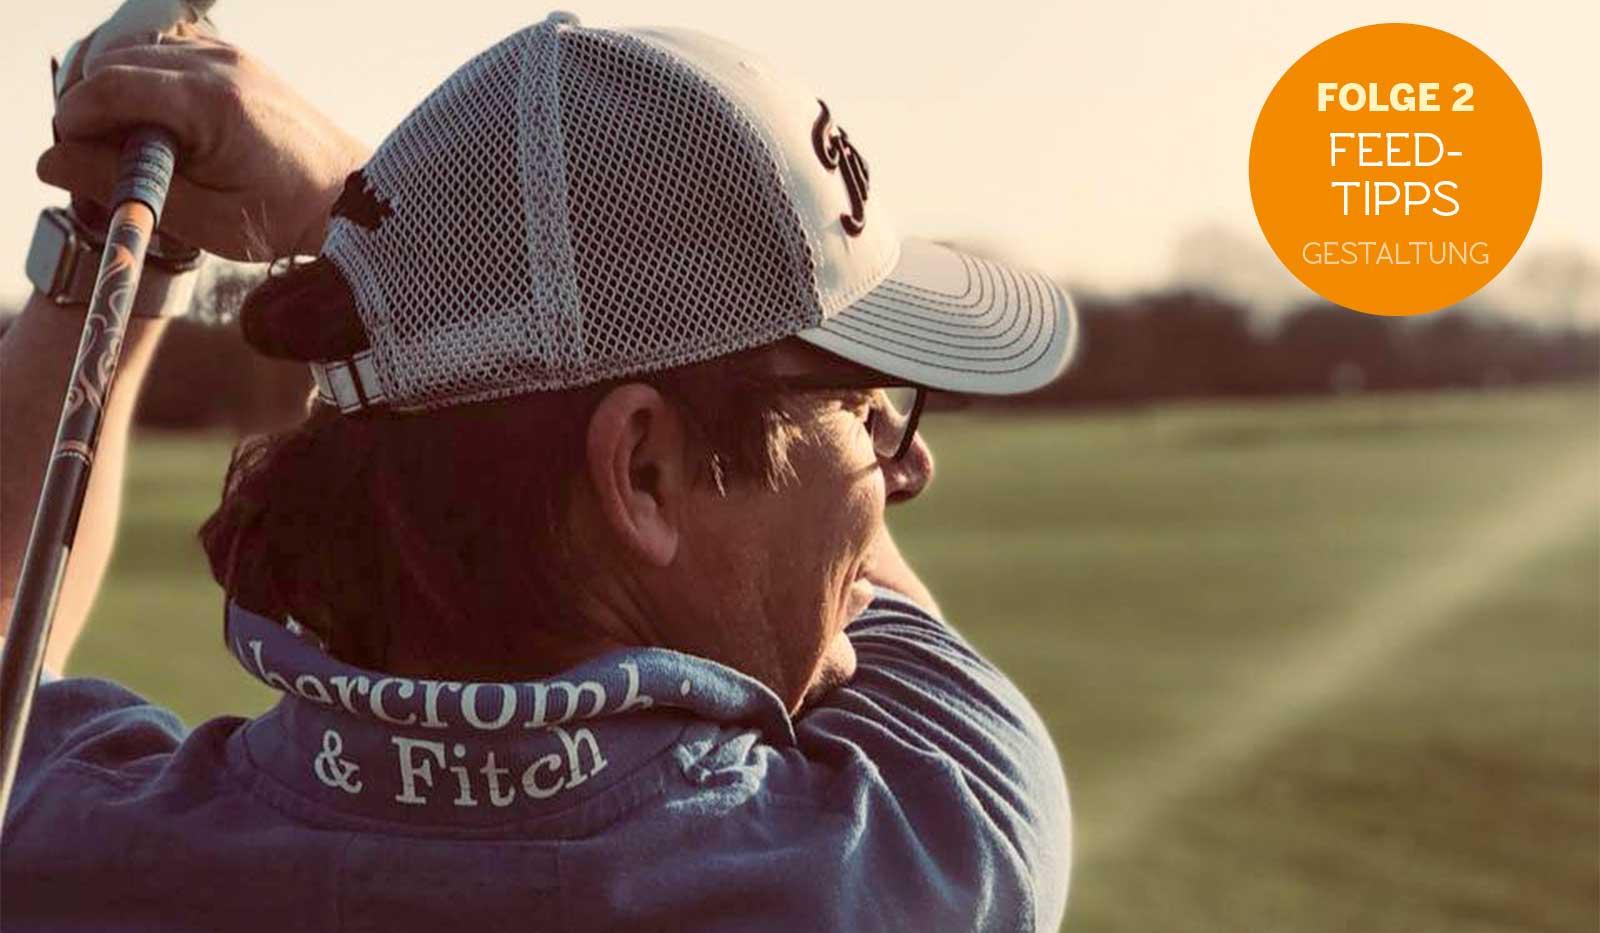 putterkoenig sm tipps - Social Media Tipps vom Golfblog_Putterkönig: Gestaltung Instagram-Feed